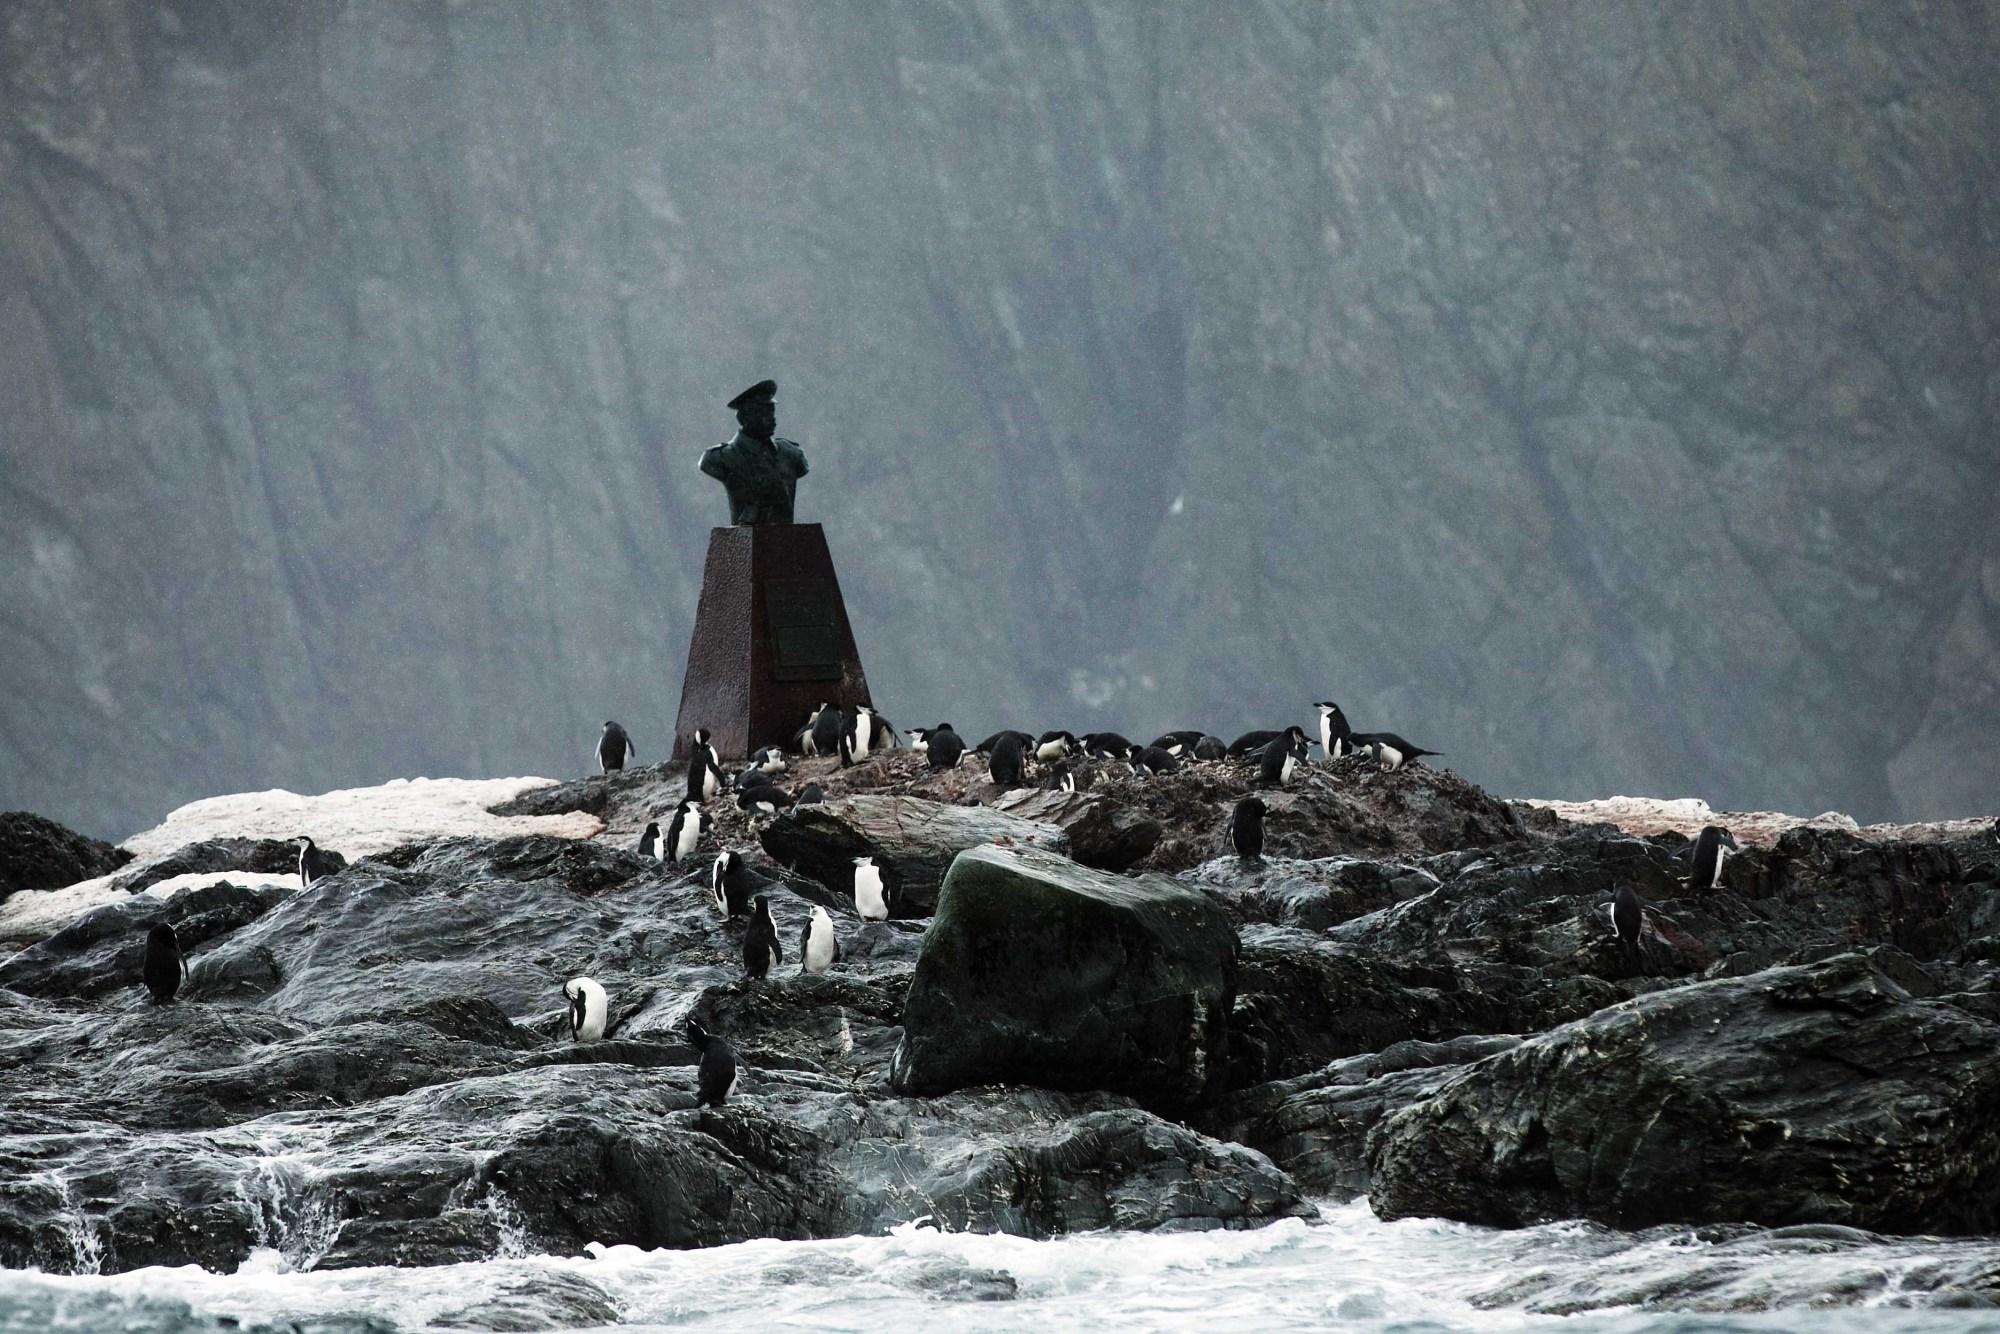 Busto di Piloto Pardo, Elephant island - Isole Shetland Meridionali ©discover.silversea.com